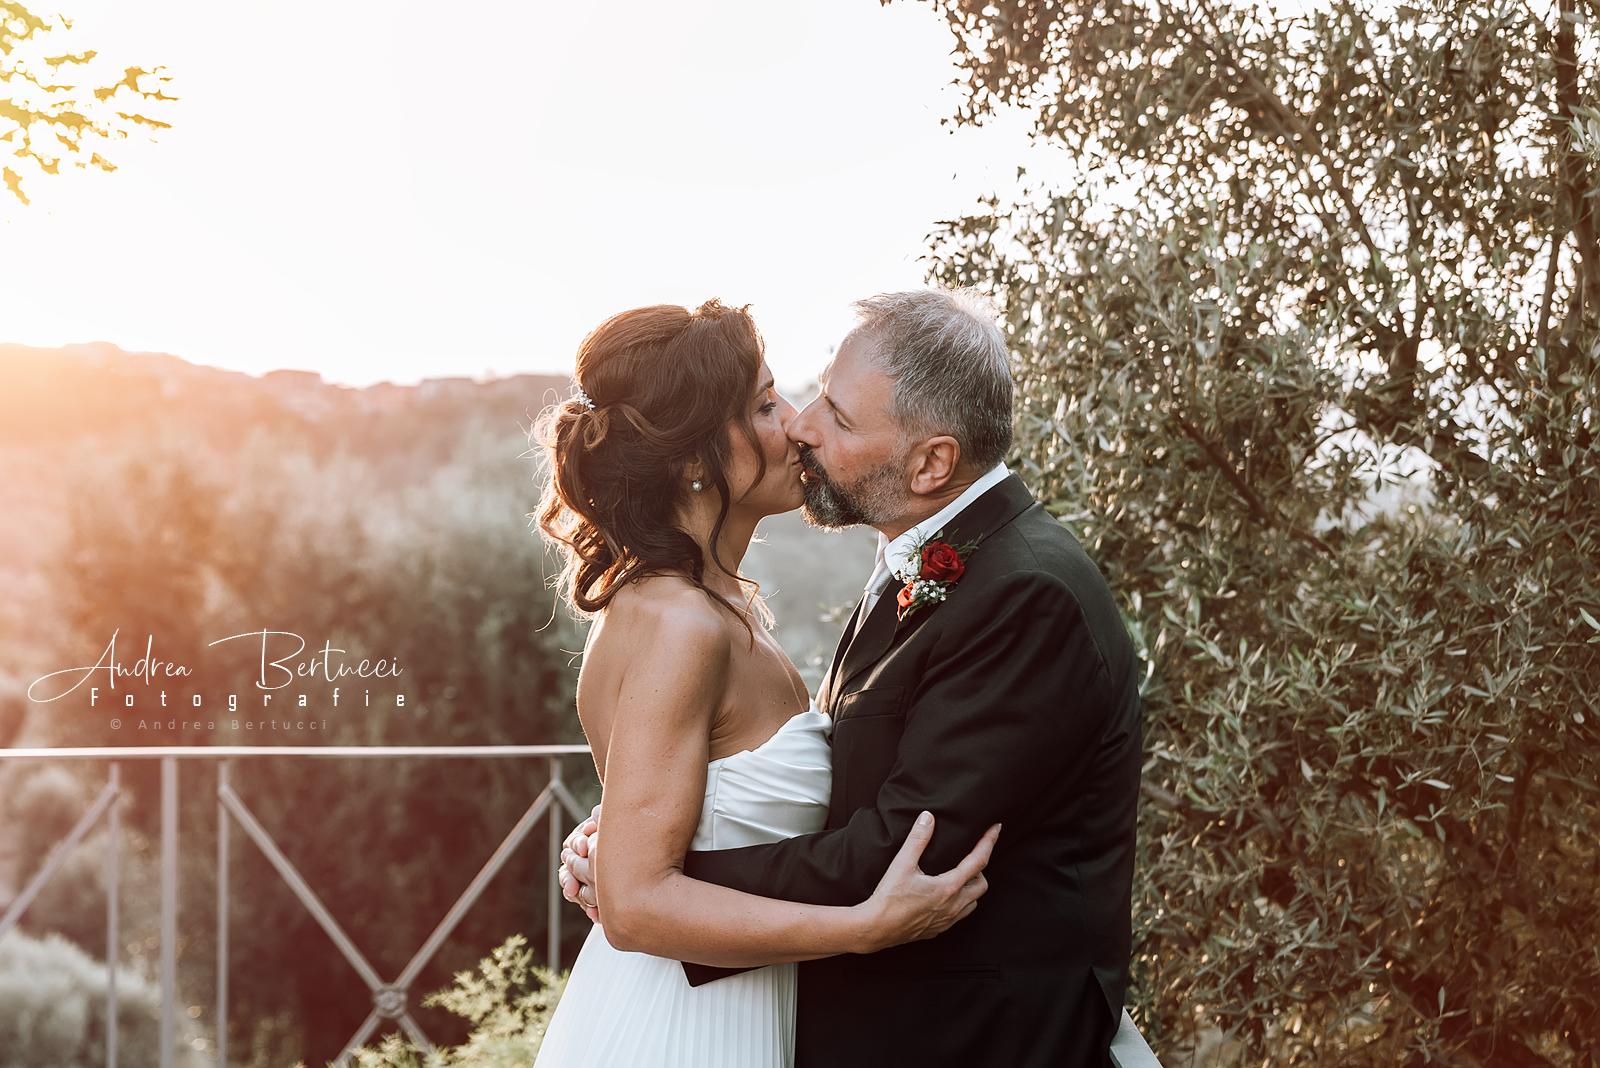 My first wedding...